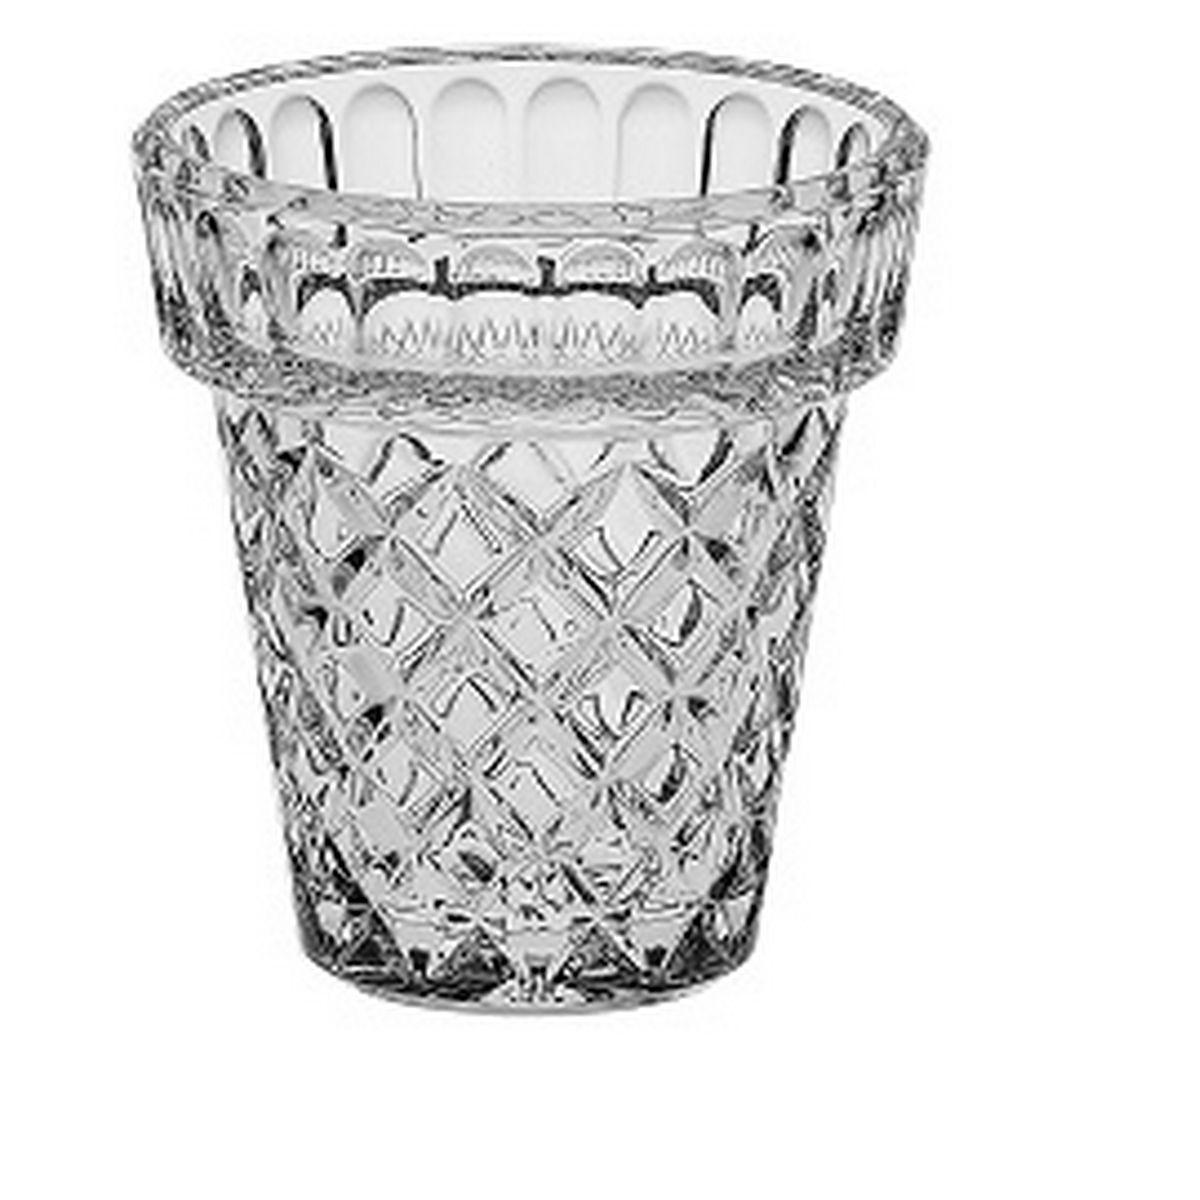 Vaza Cristal Bohemia 13.4 Cm 2021 aranjareamesei.ro